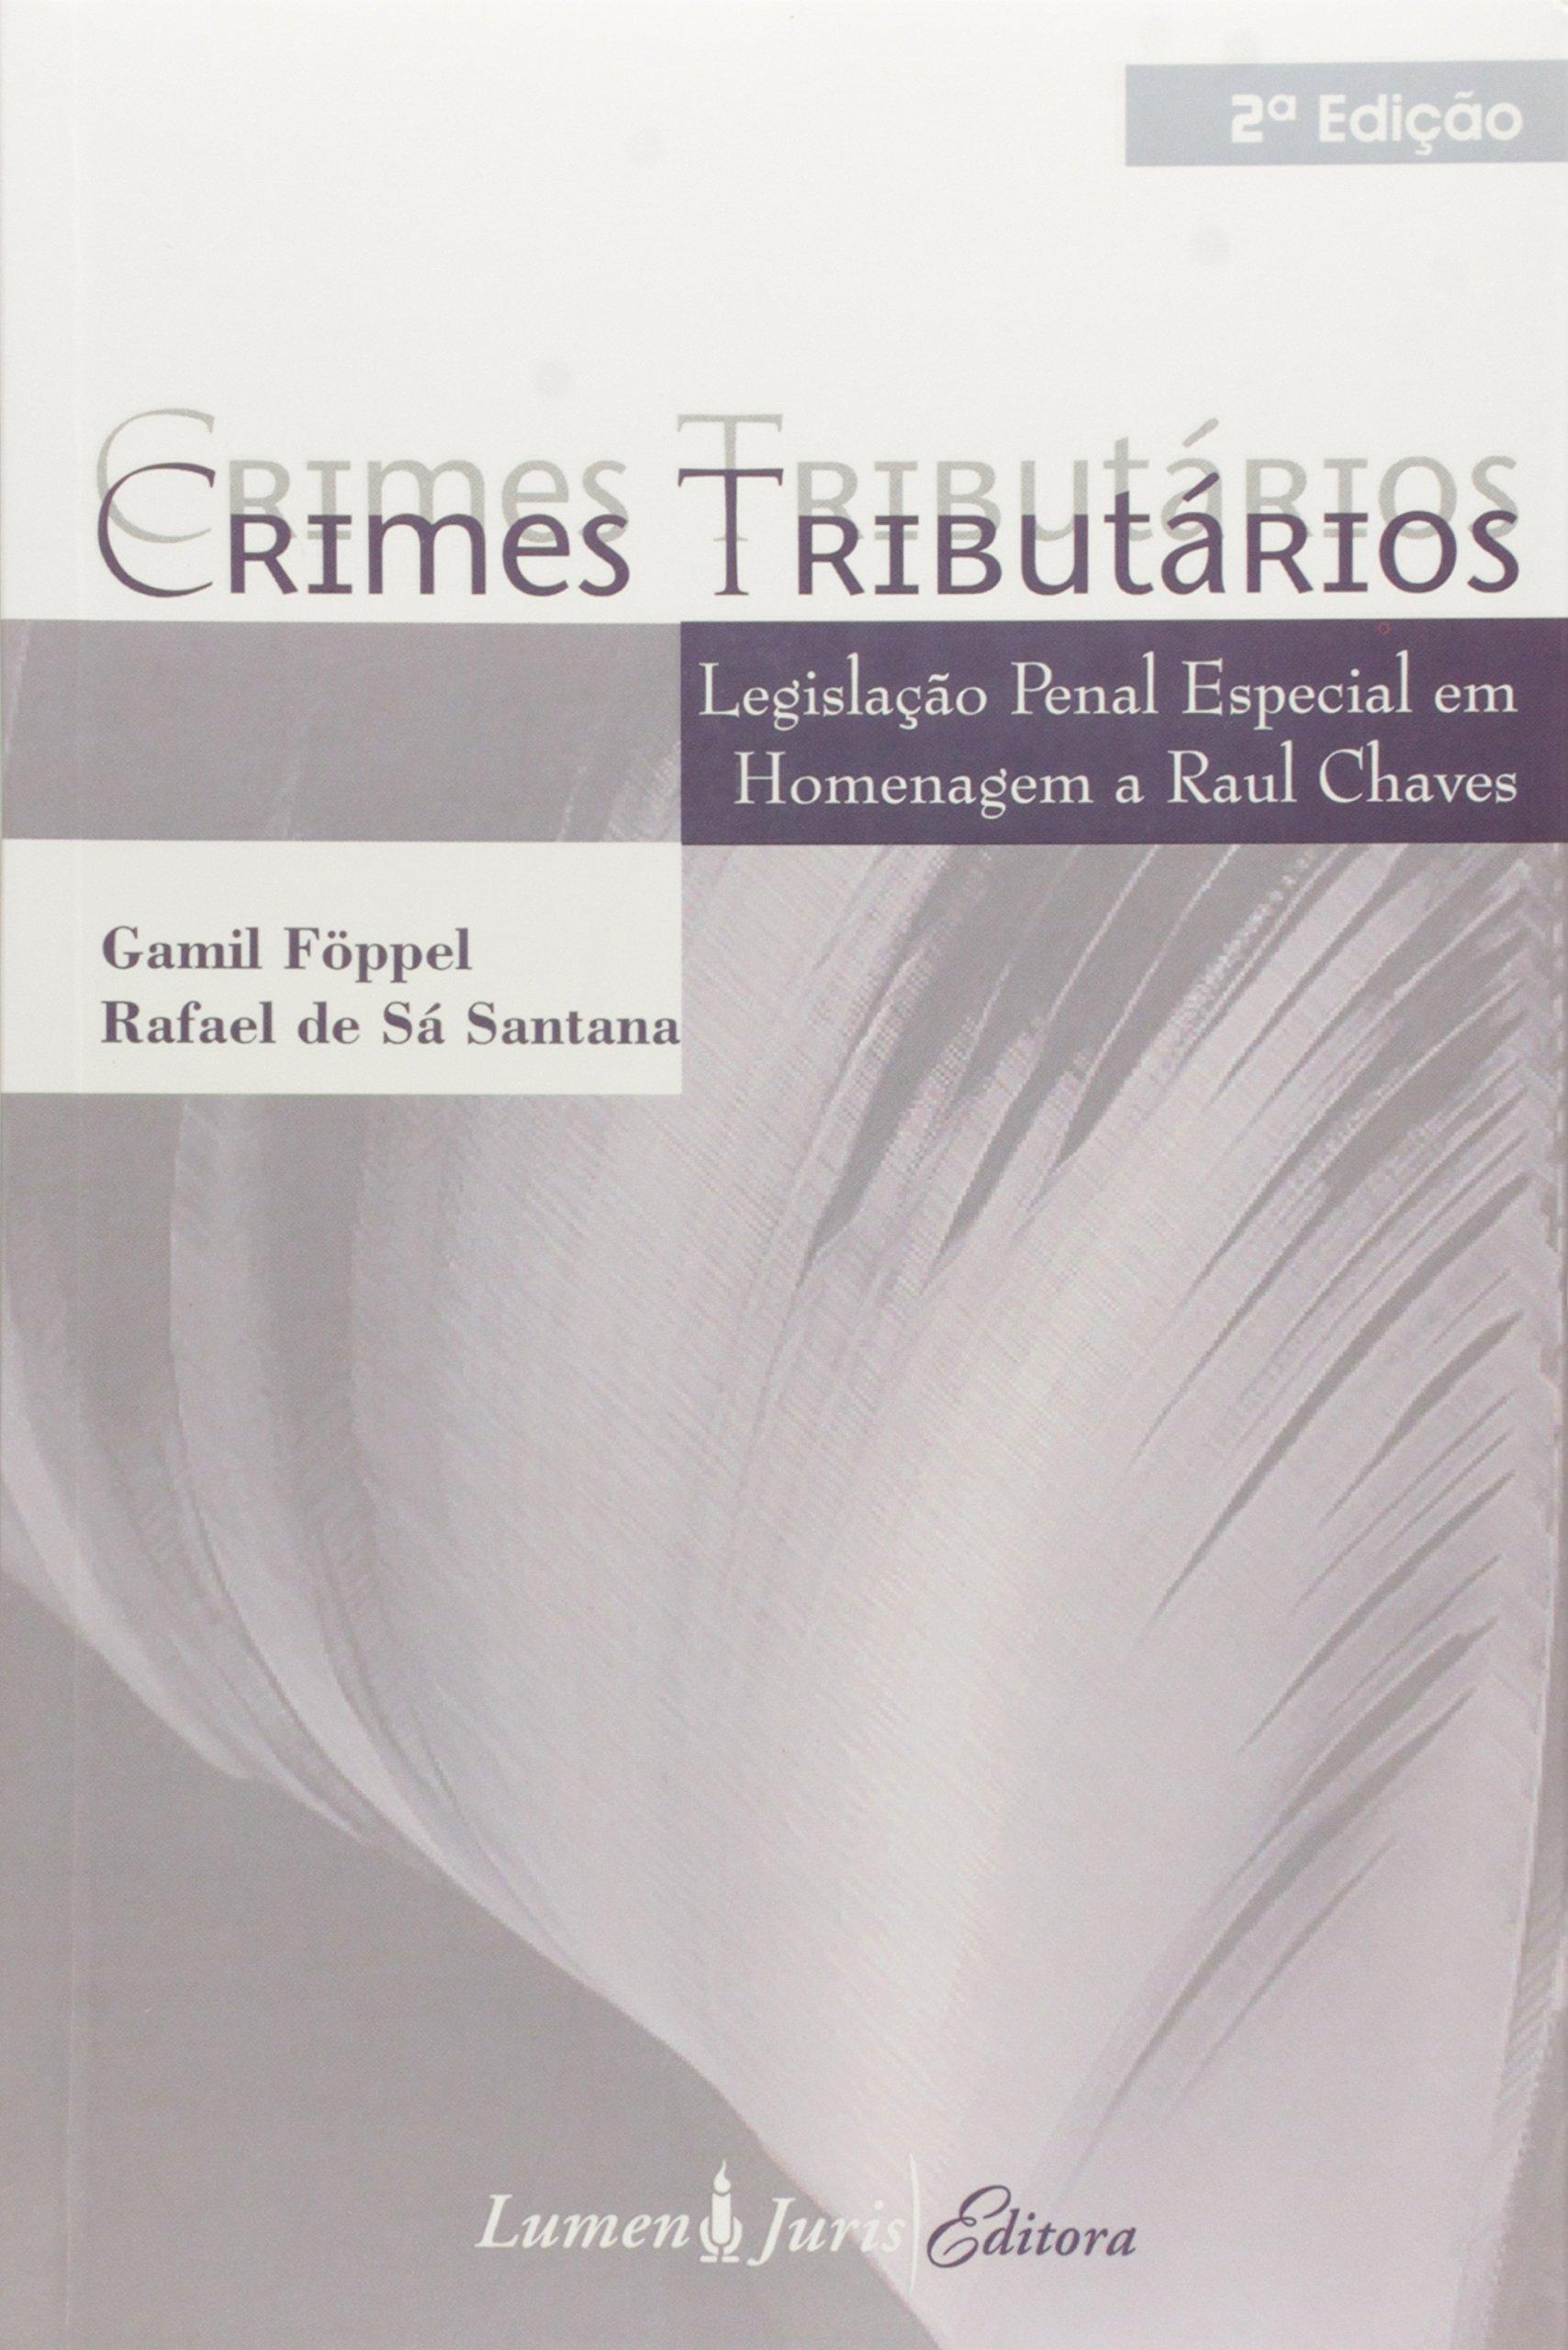 Download Crimes Tributarios pdf